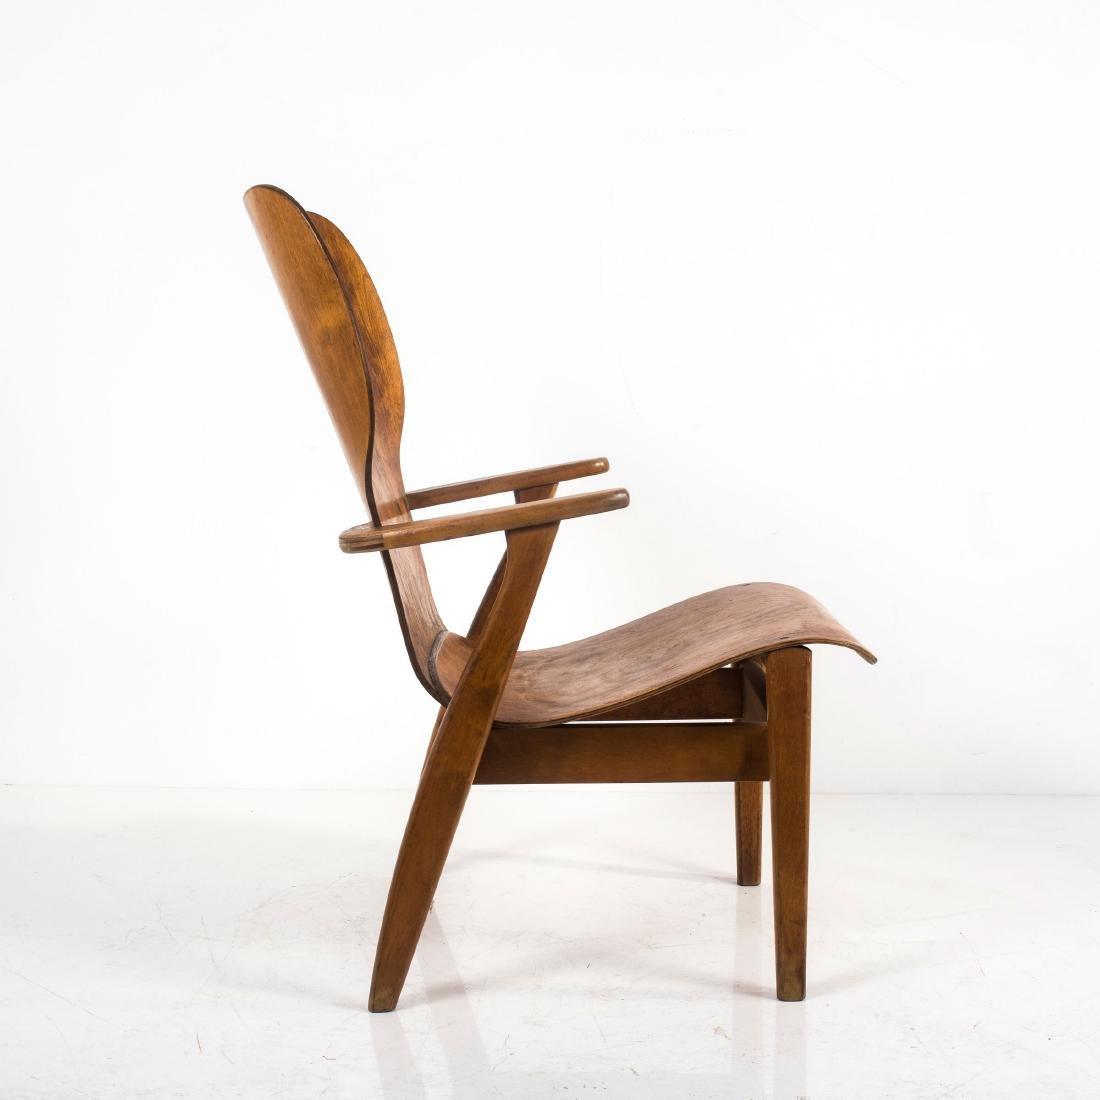 Armchair 'Domus Lux', c1948 - 4